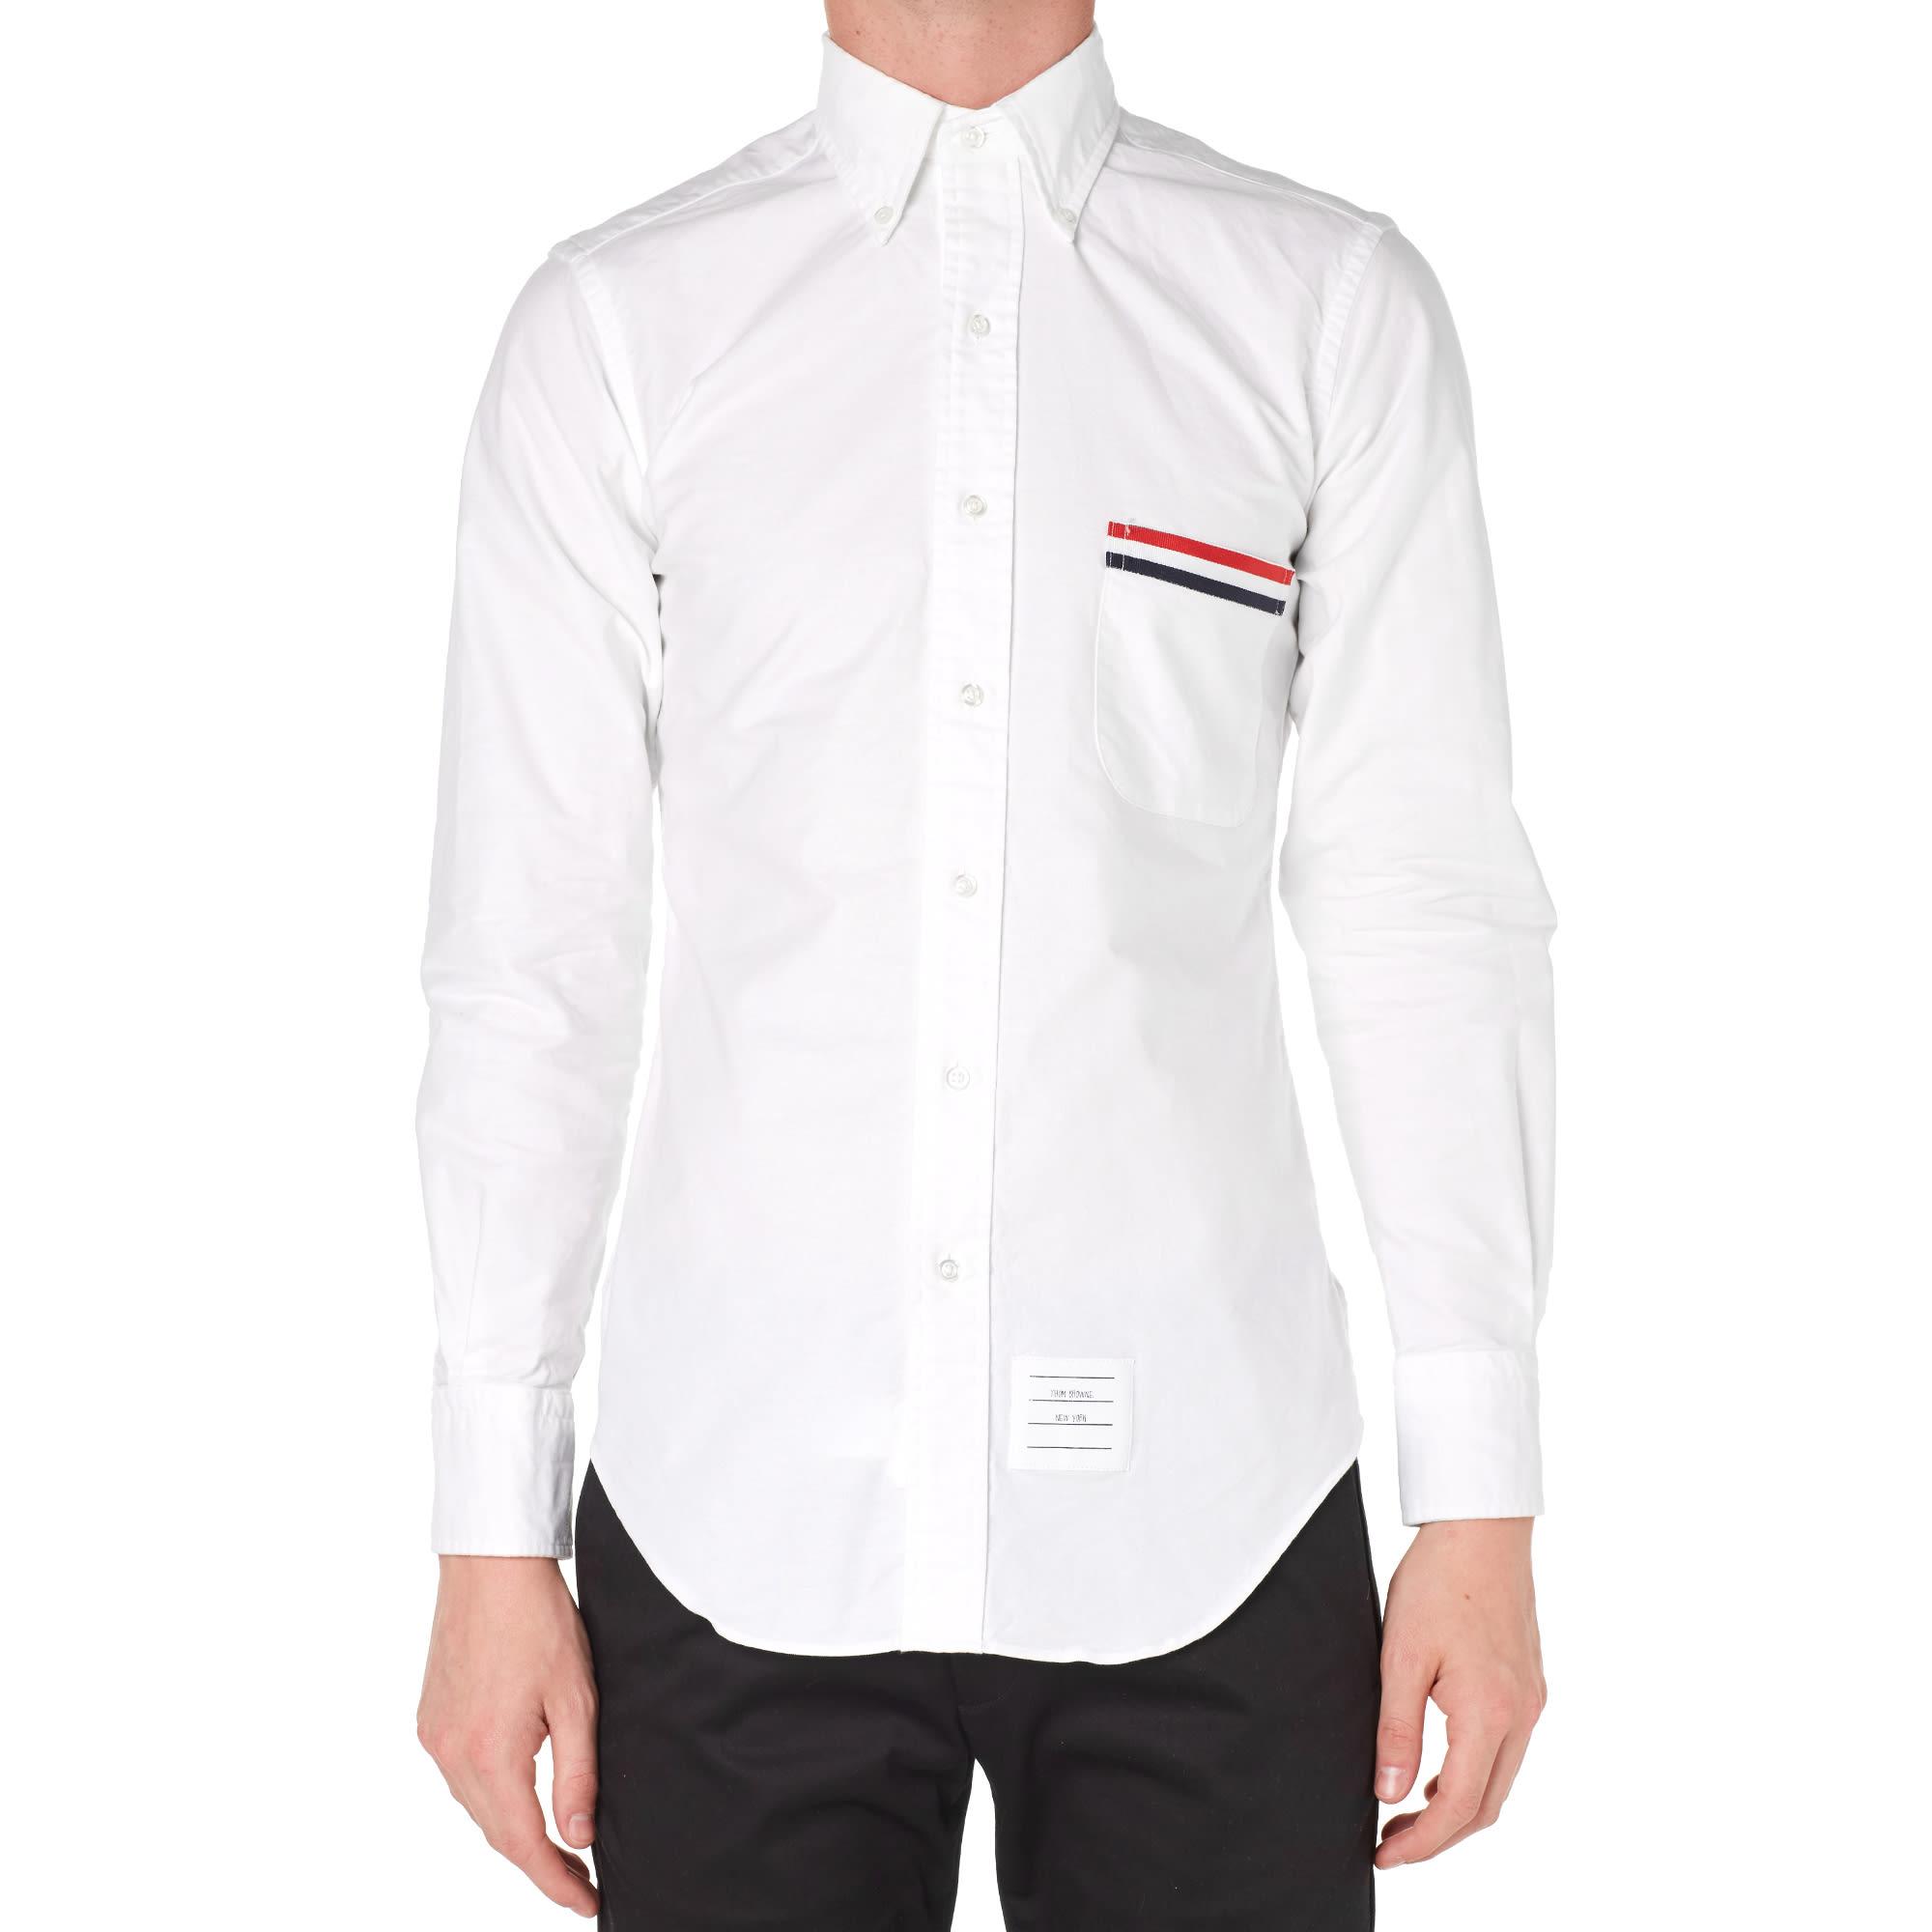 Thom browne grosgrain pocket oxford shirt white for Thom browne white shirt